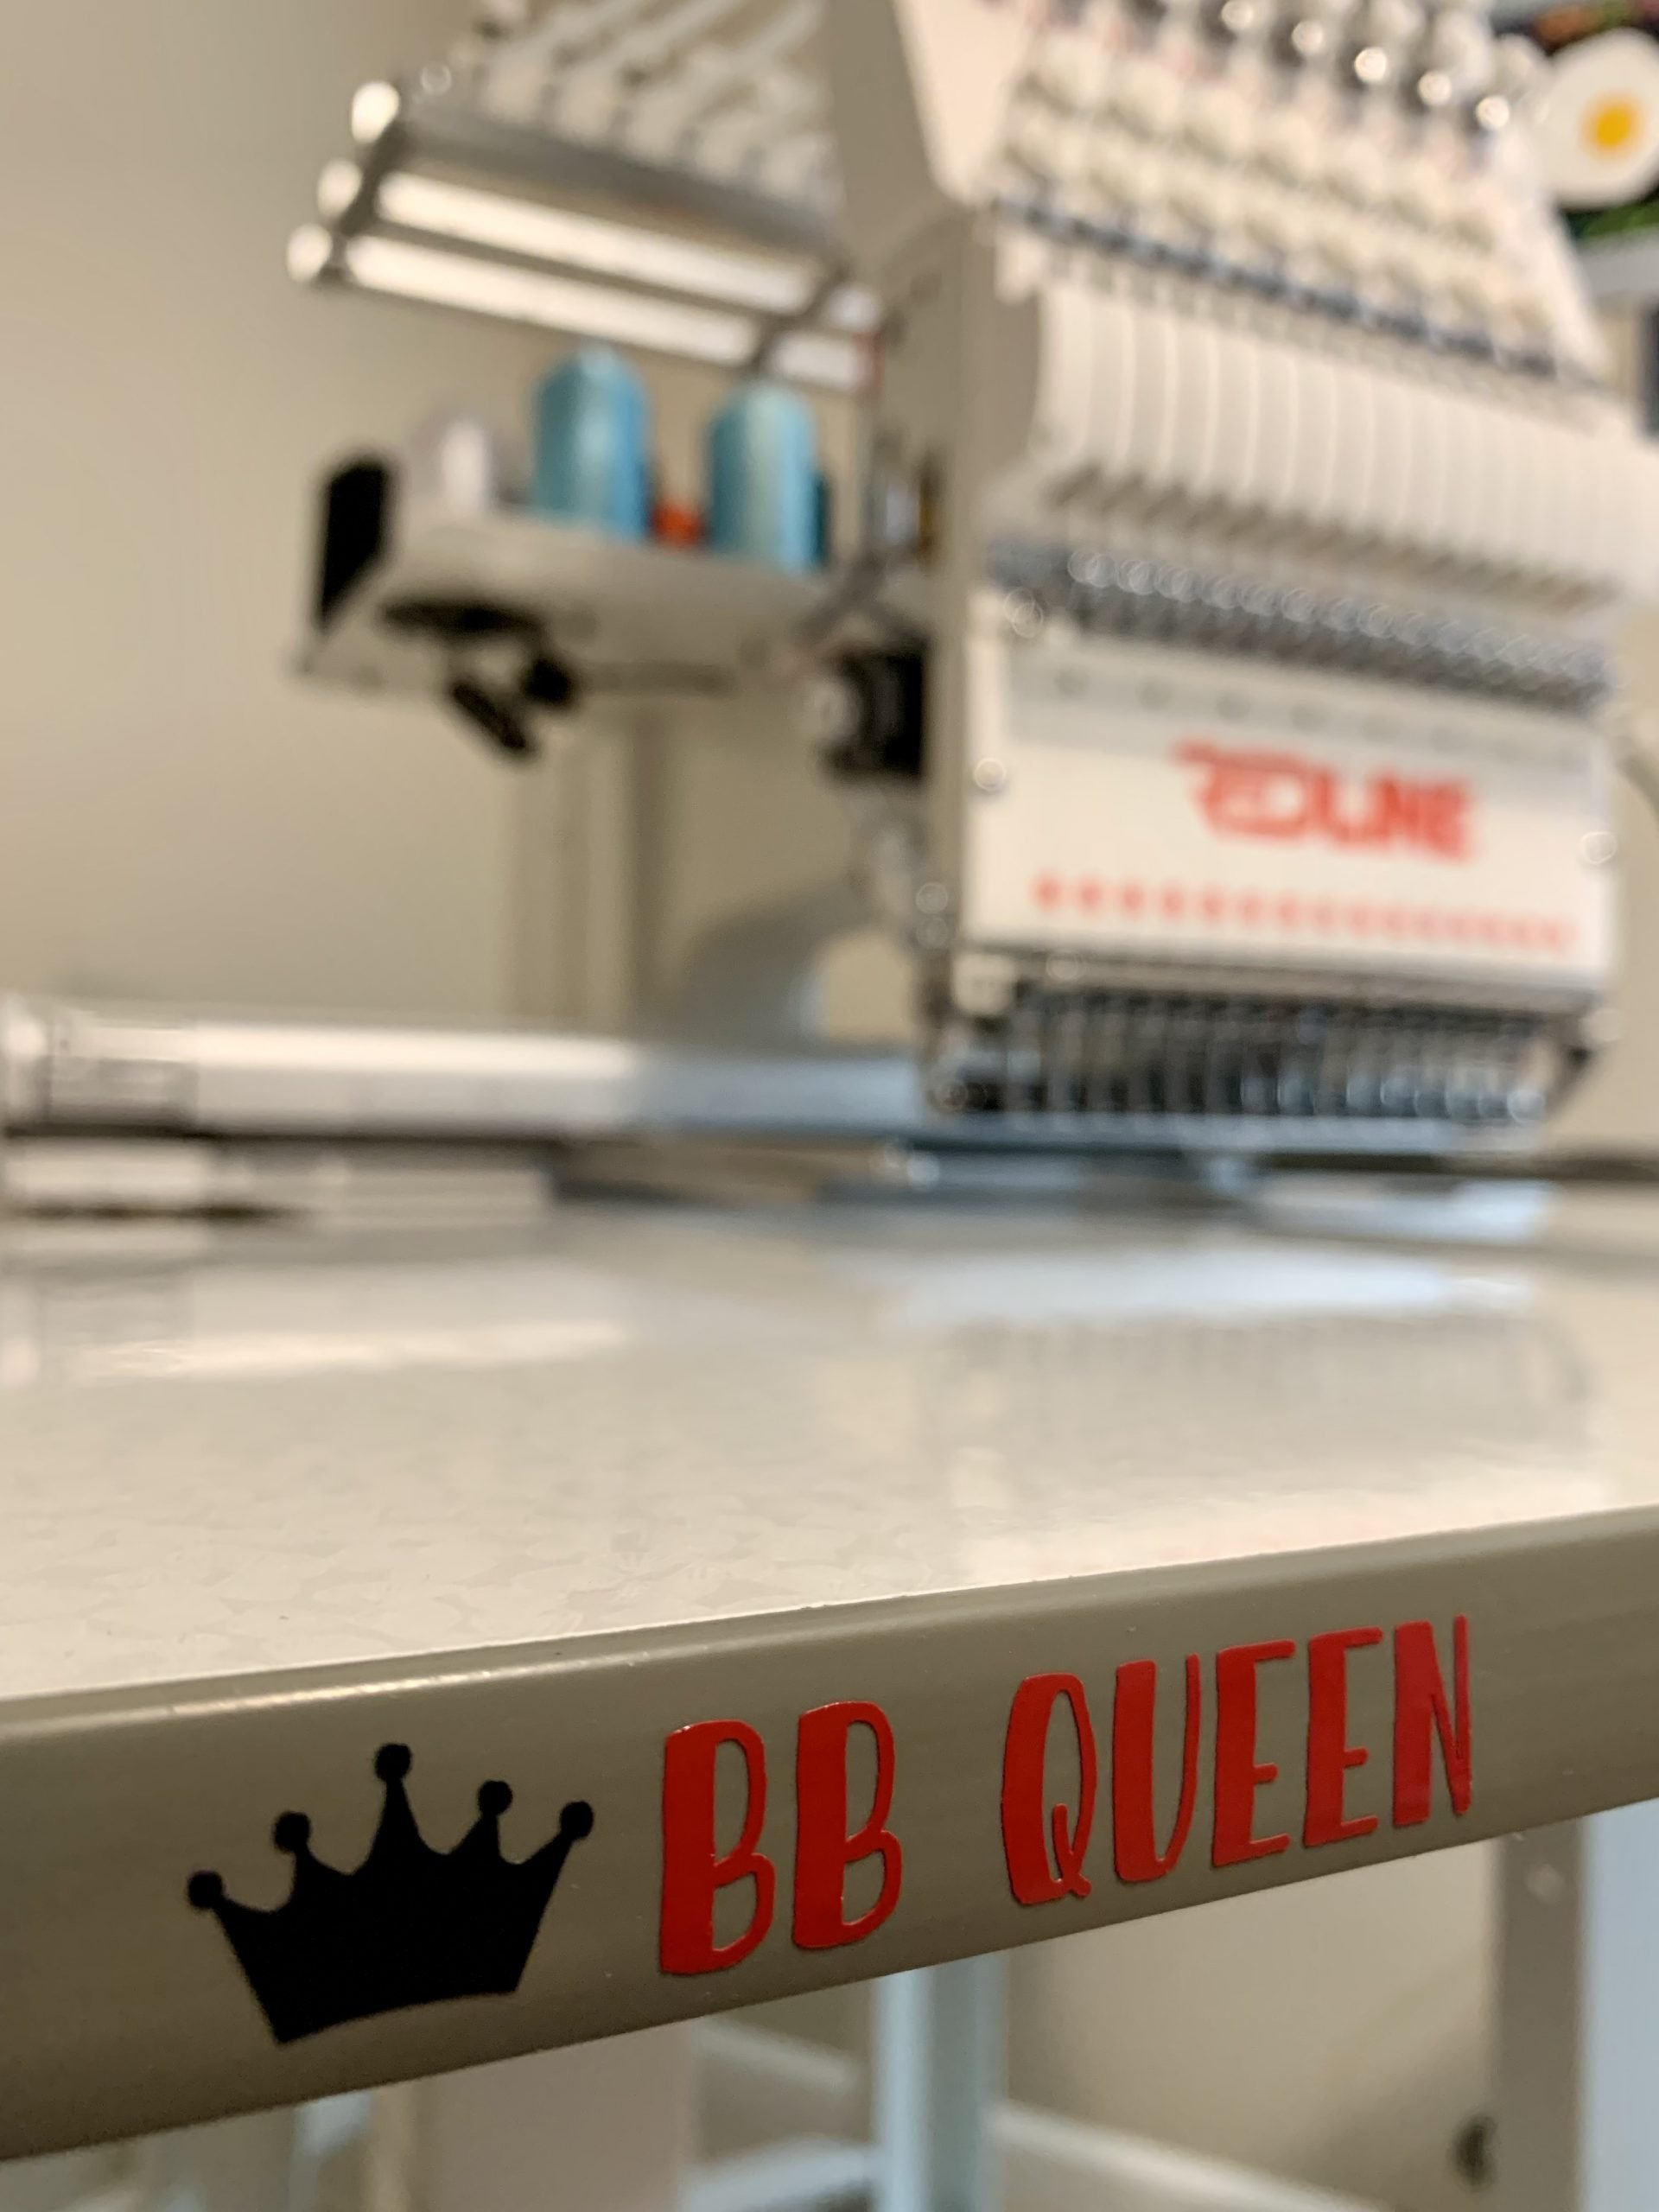 BB Queen